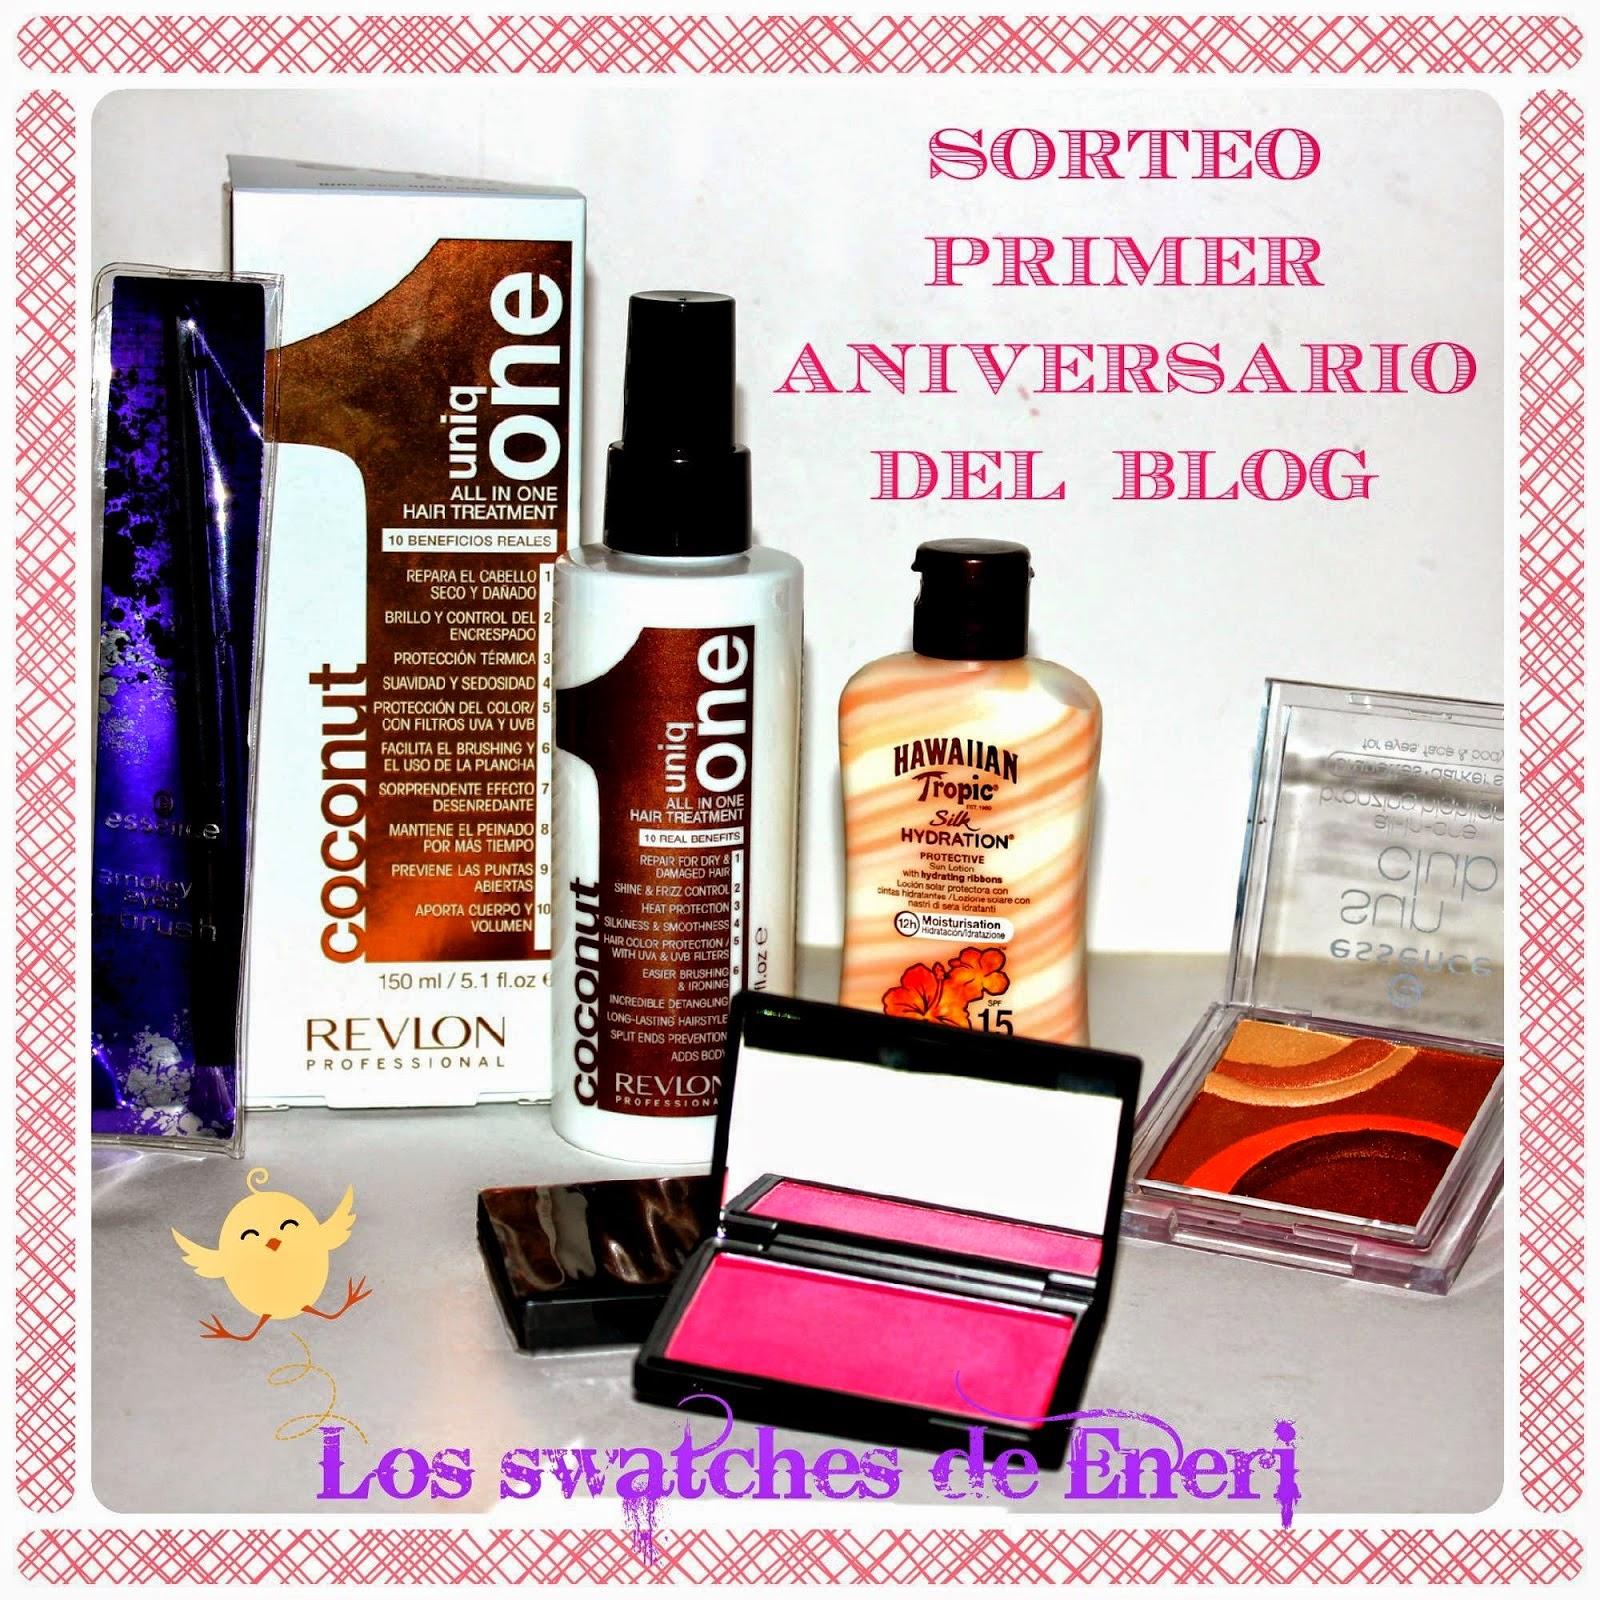 http://losswatchesdeeneri.blogspot.com.es/2014/09/sorteo-nacional-primer-aniversario-del.html